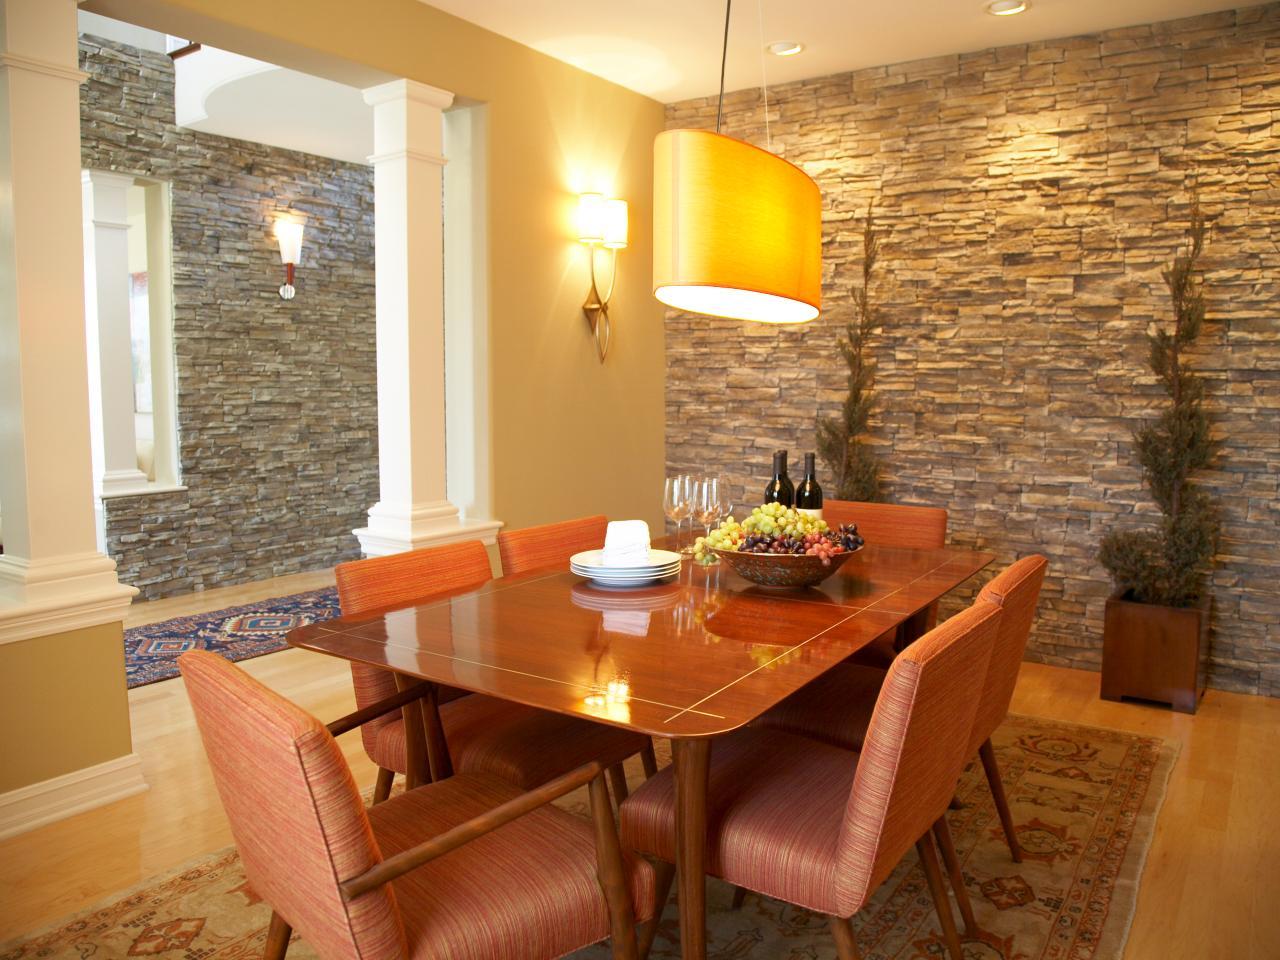 Designing A Home Lighting Plan HGTV - Home lighting designs